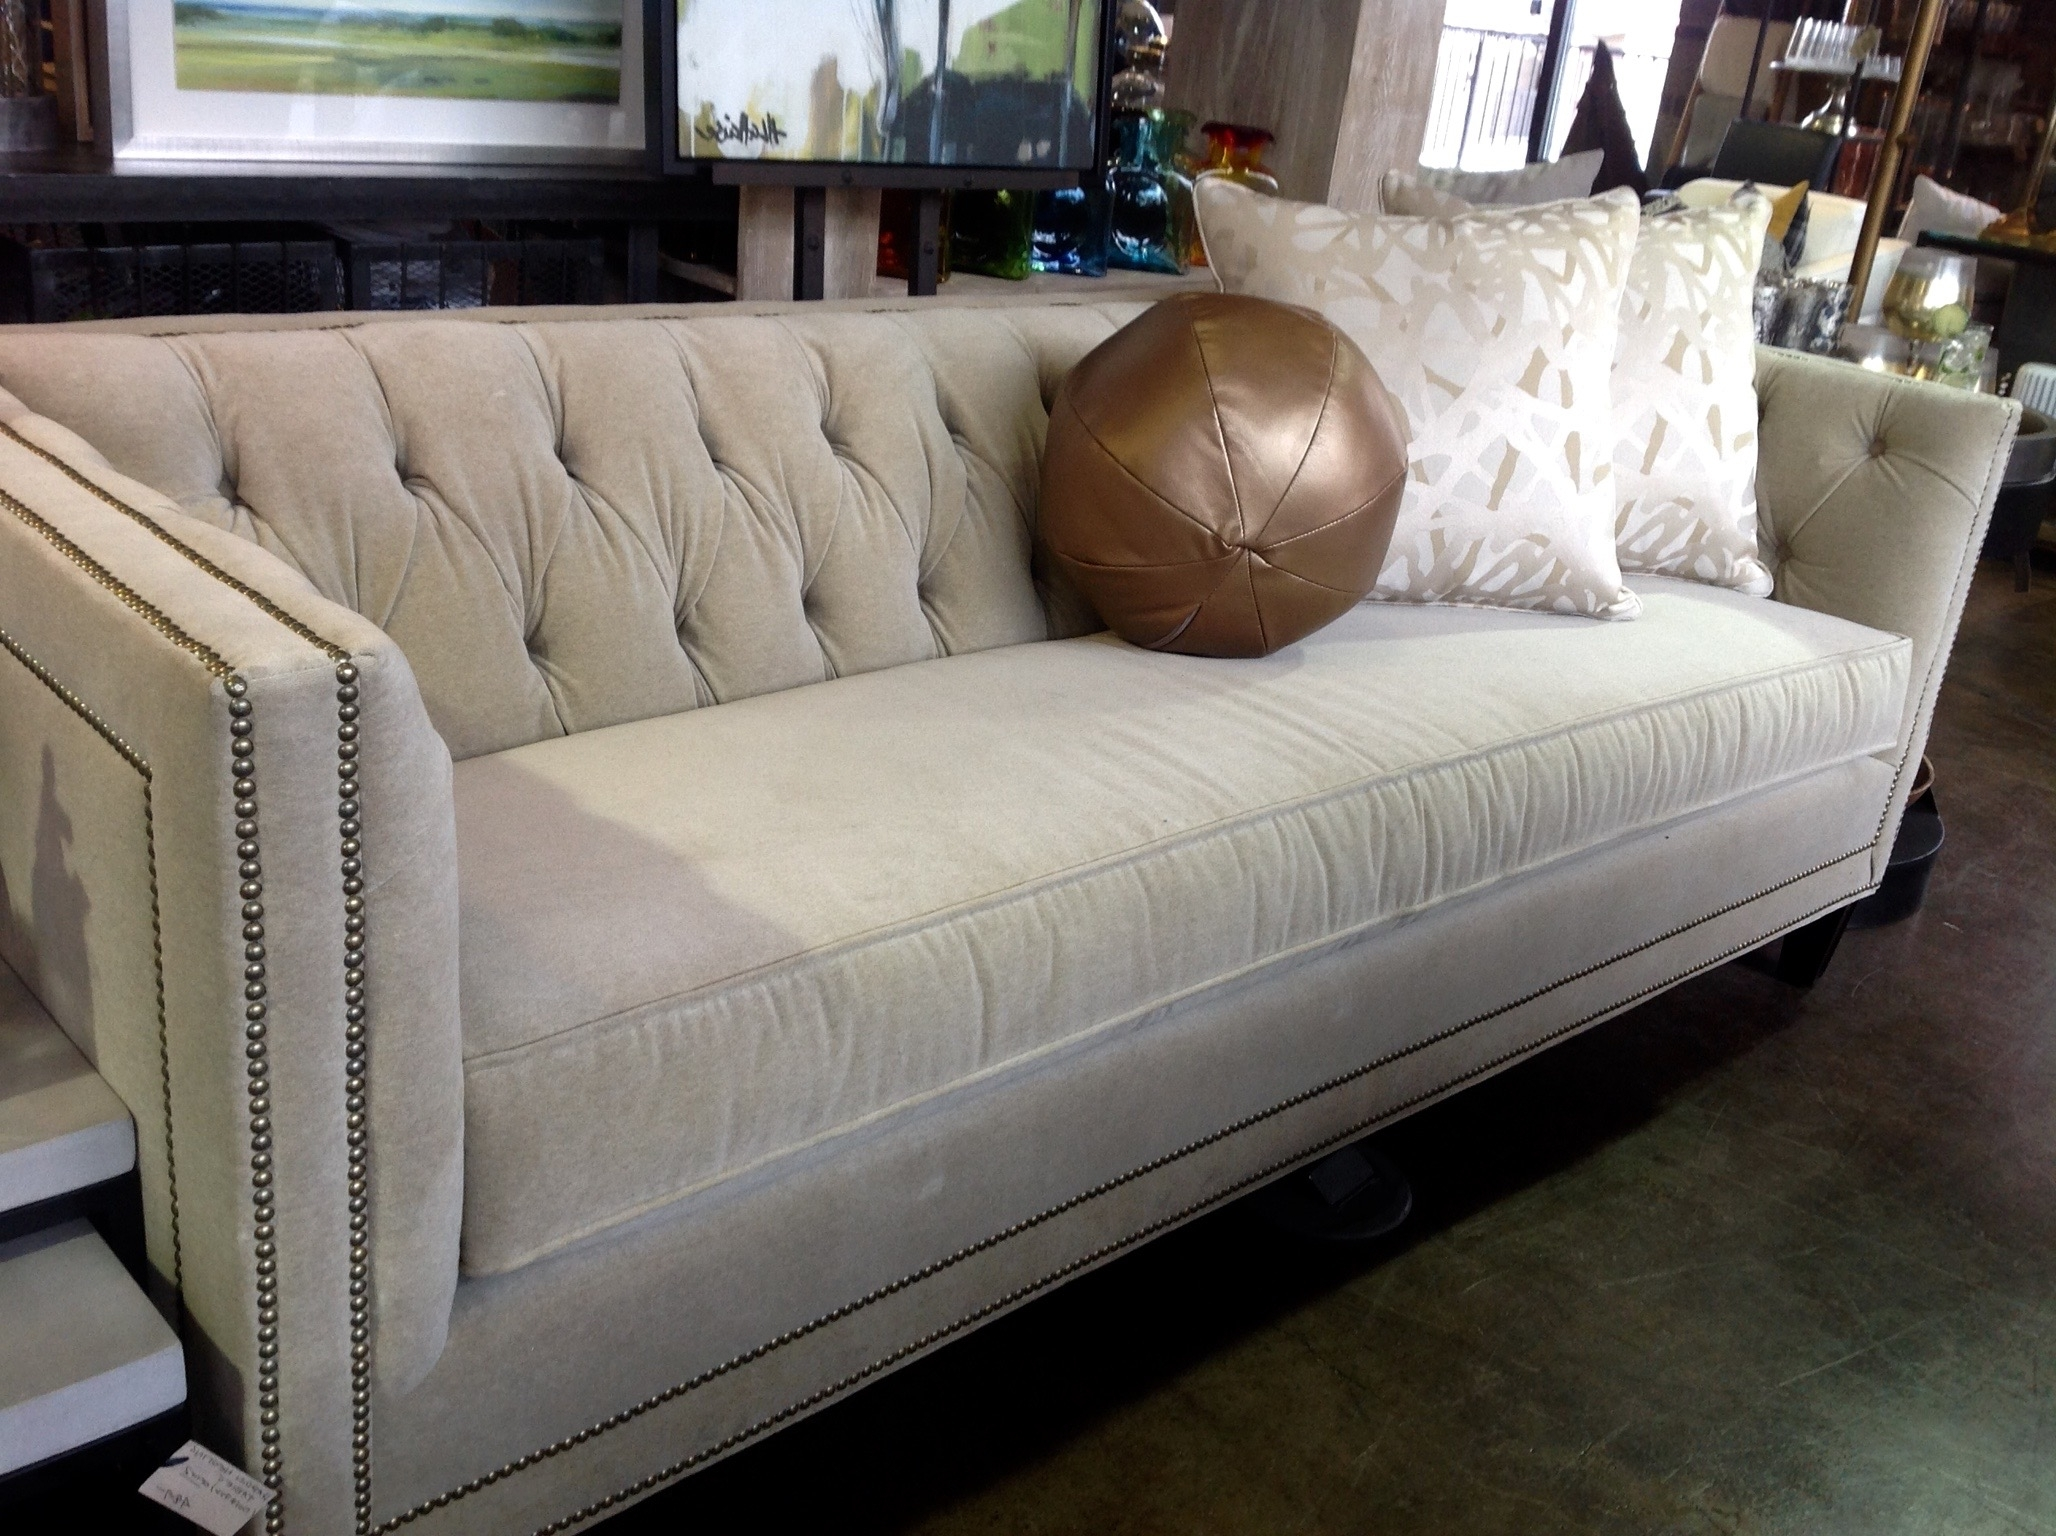 Kaden Sofa – Lulu's Furniture & Decor With Regard To Current Norwalk Sofas (Gallery 4 of 20)